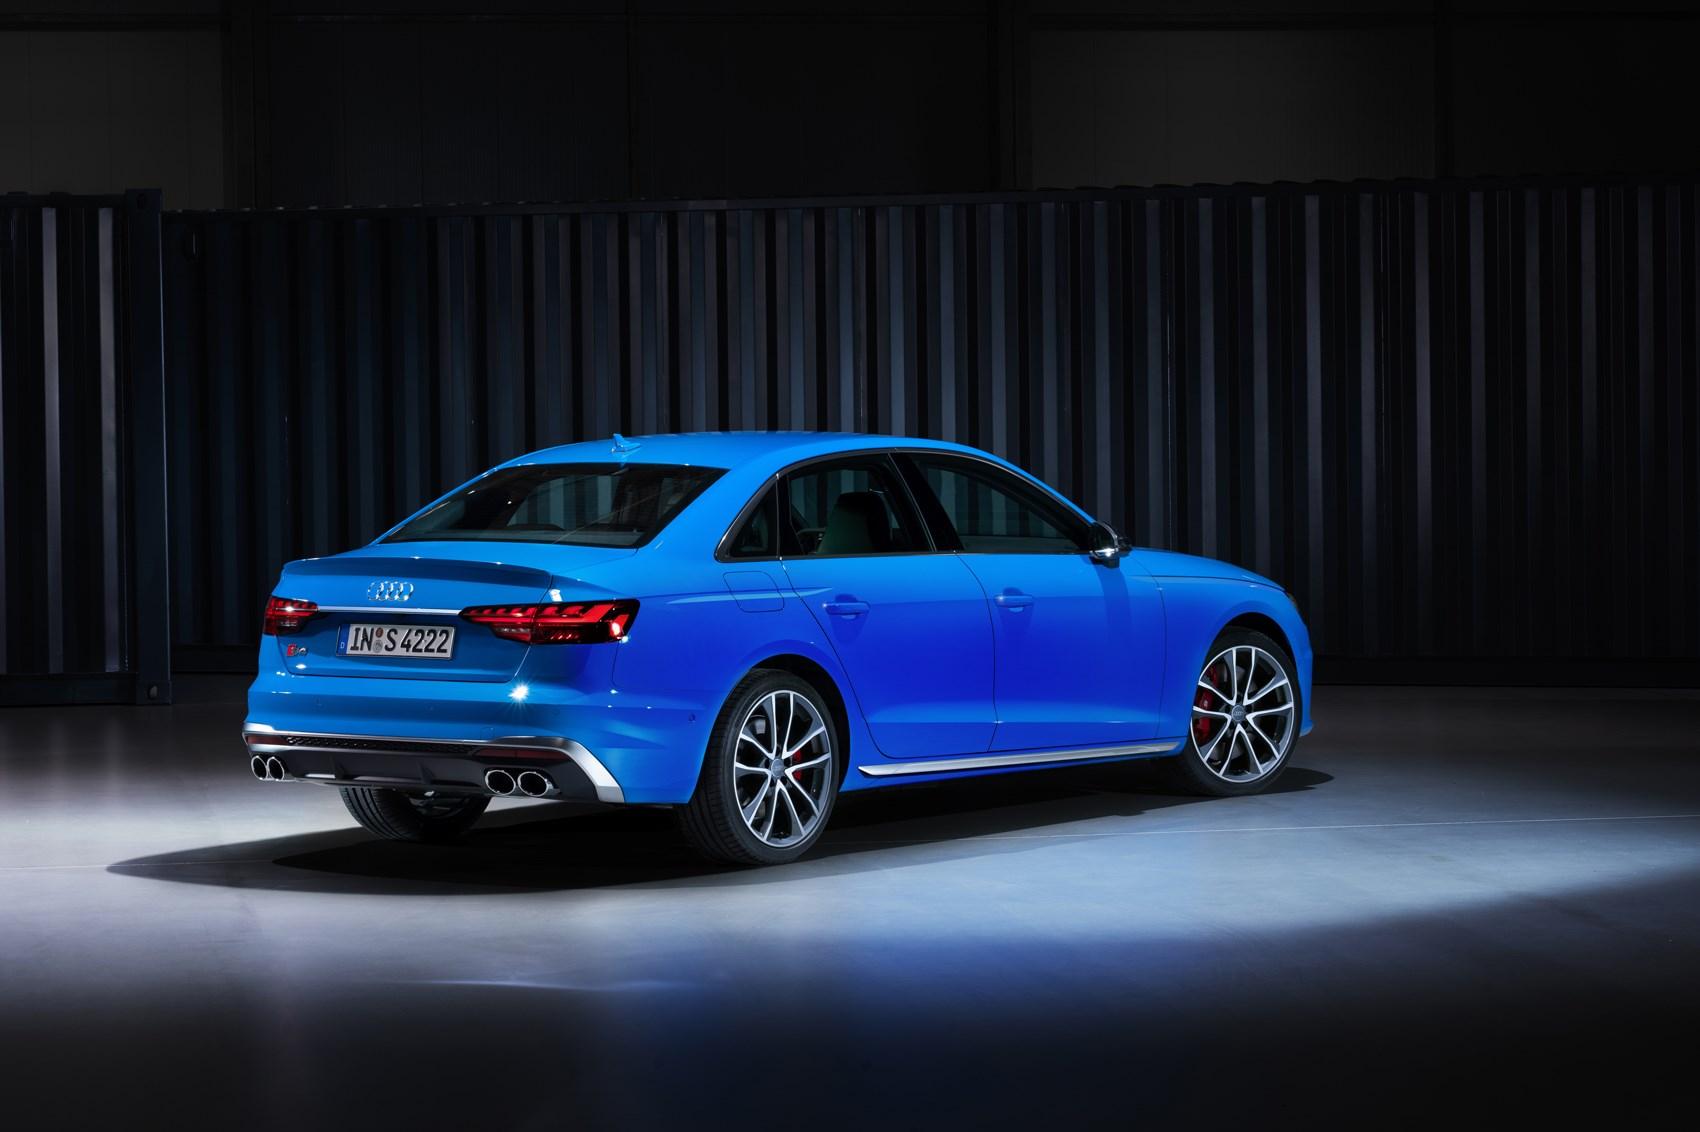 Kelebihan Audi S4 2019 Murah Berkualitas